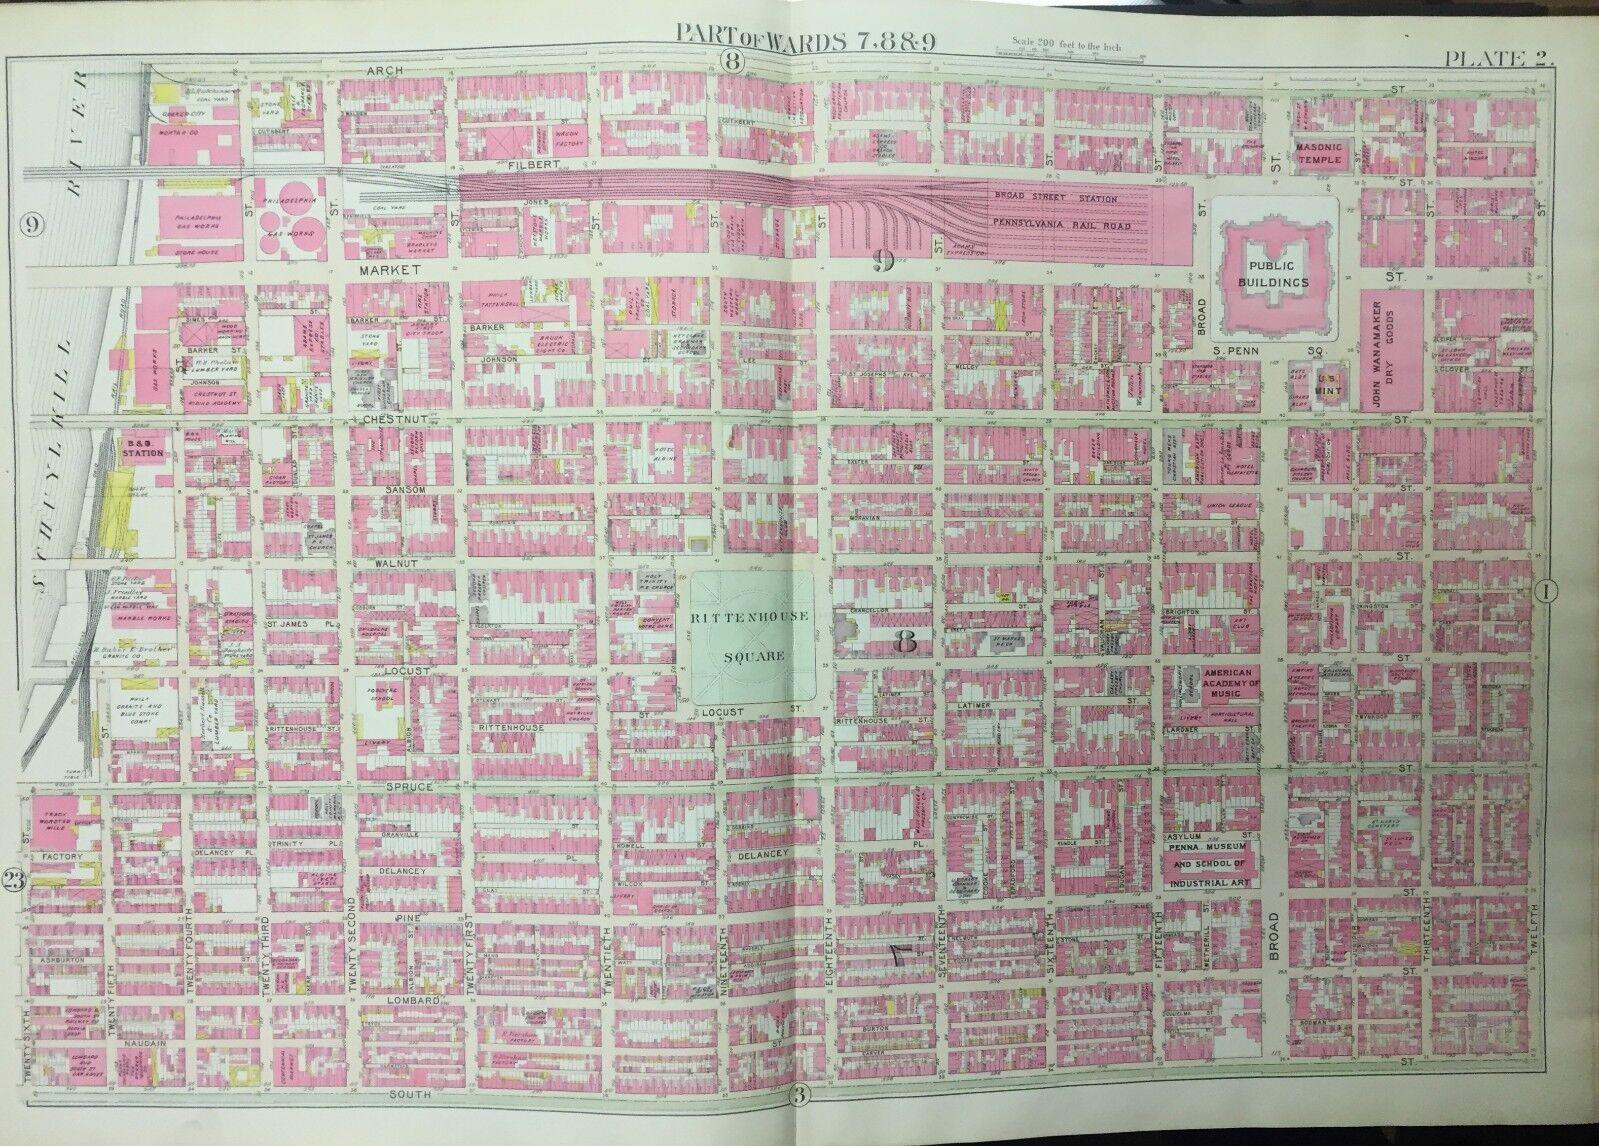 1895 PHILADELPHIA PA BROAD STREET STATION RITTENHOUSE SQUARE COPY ATLAS MAP